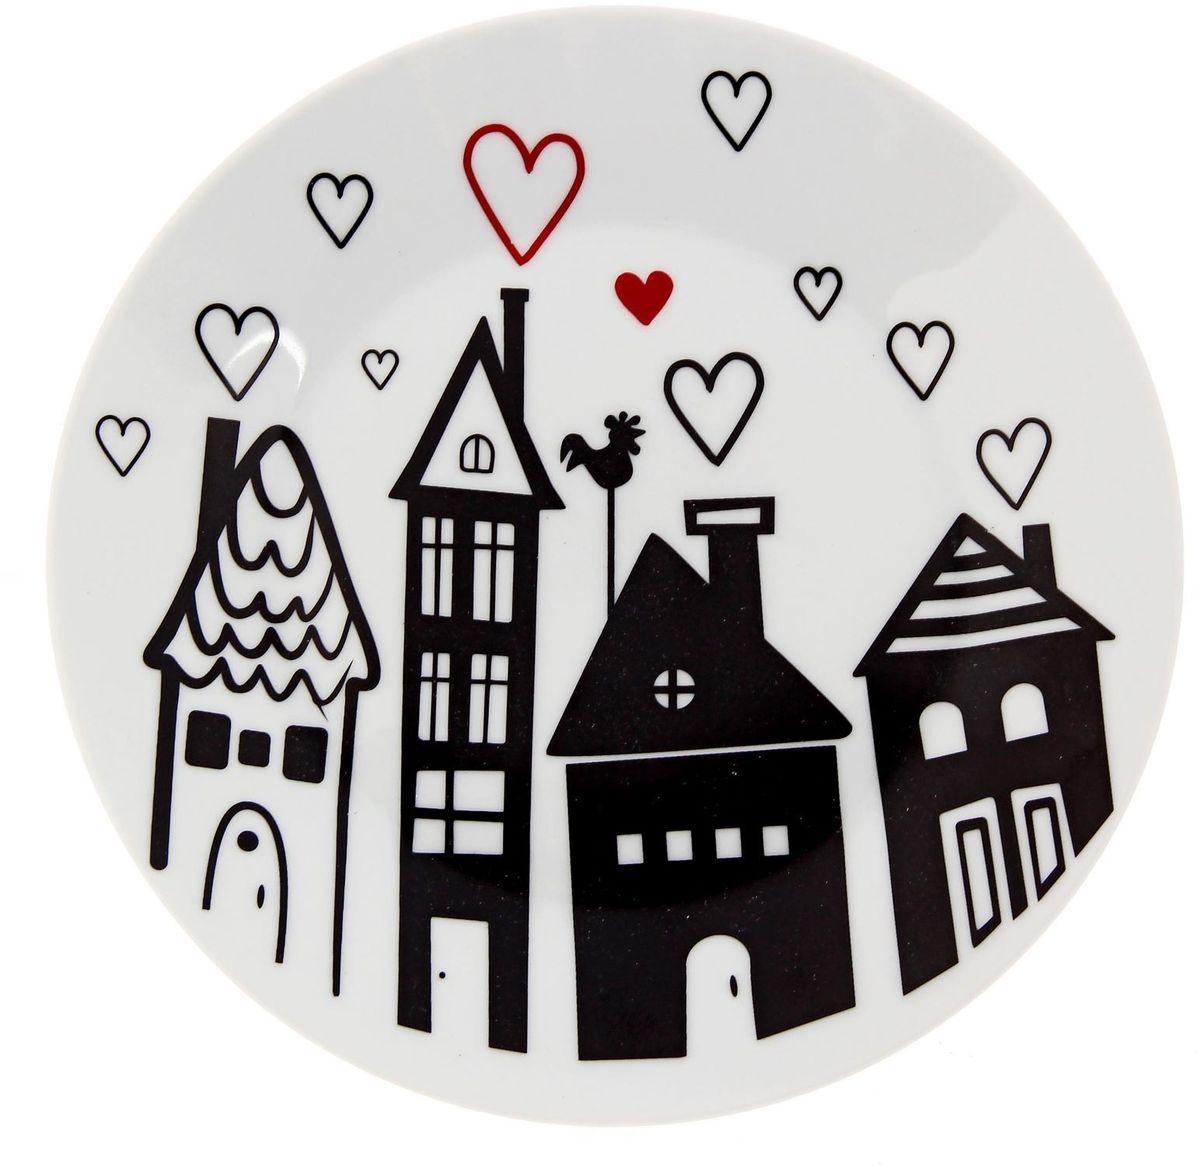 Тарелка мелкая Сотвори чудо Город любви, диаметр 20 см тарелка мелкая сотвори чудо бананы диаметр 20 см